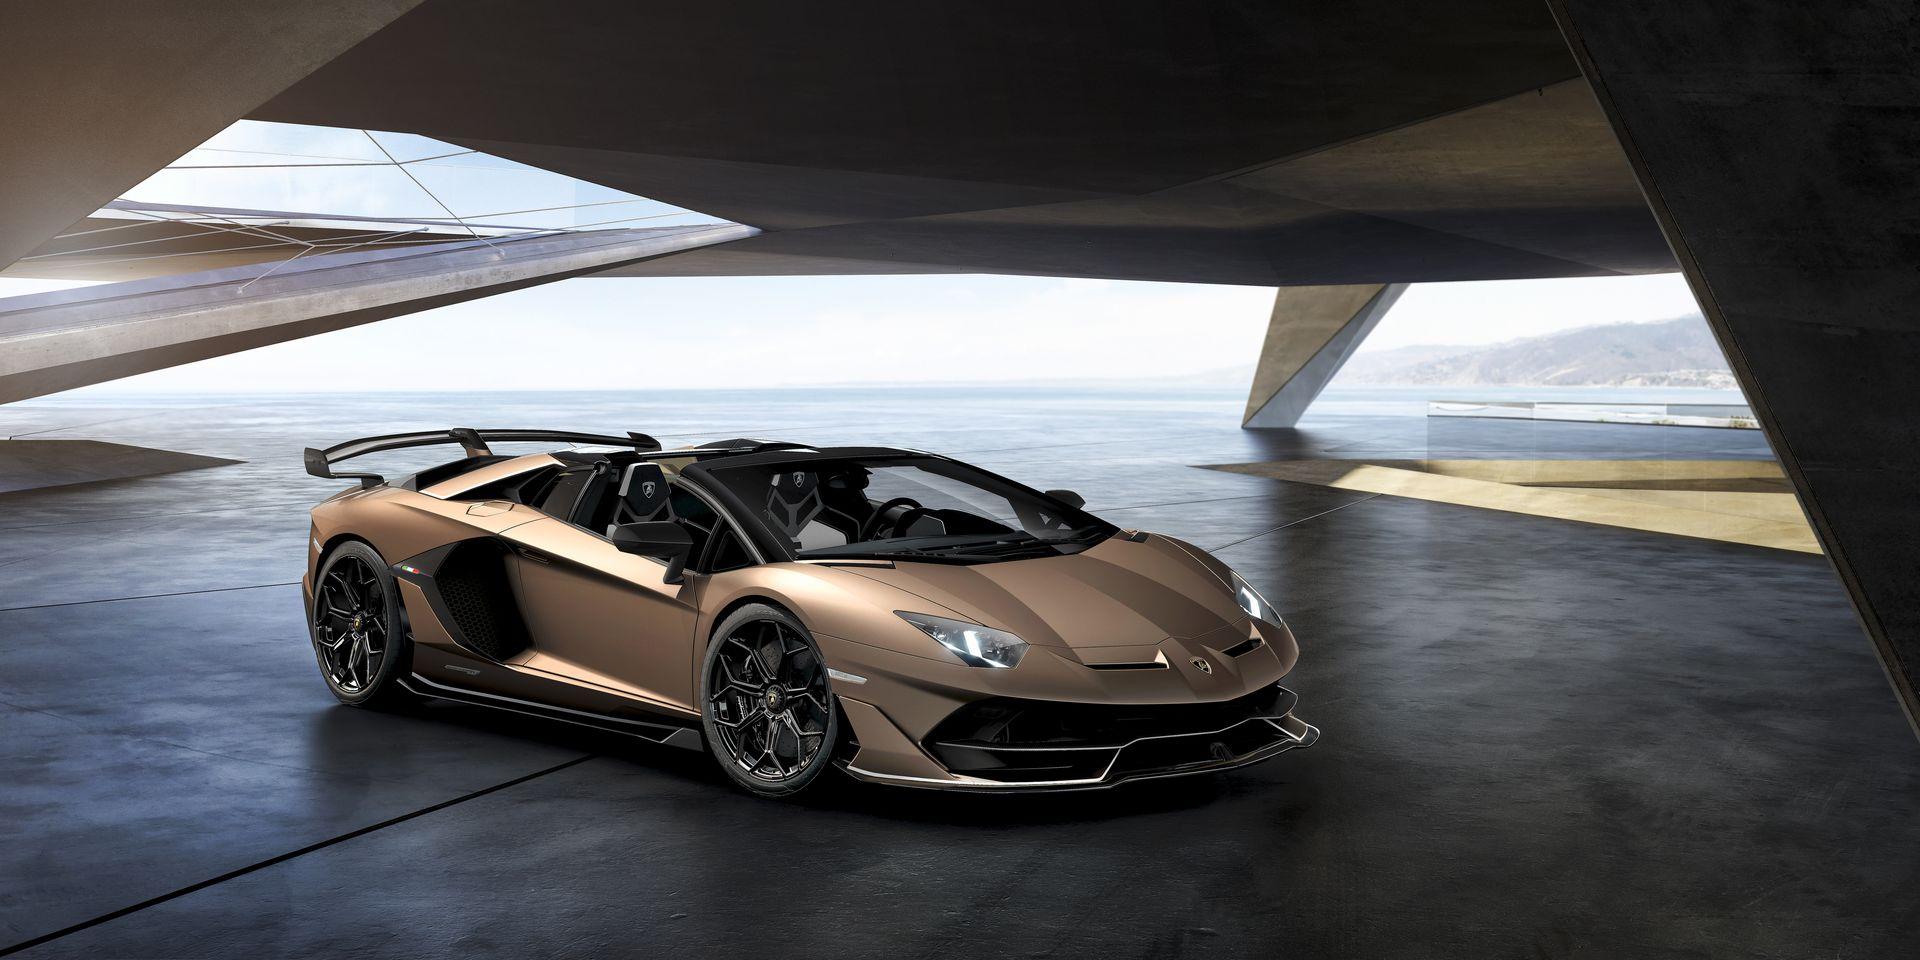 Lamborghini Aventador Svj Roadster 15